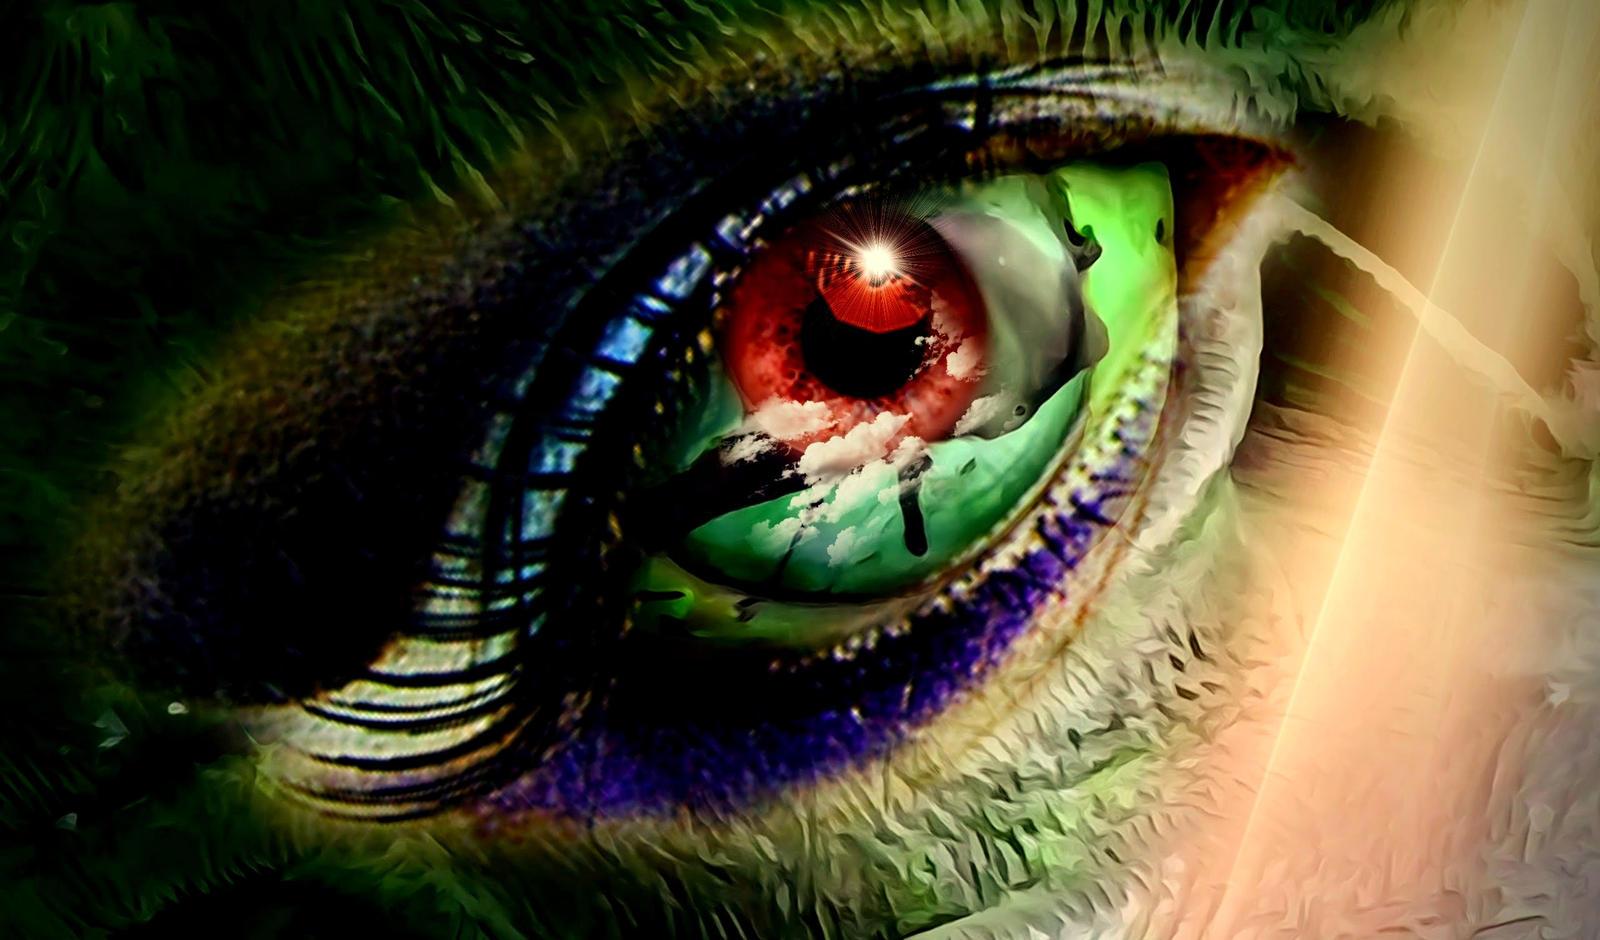 mystic eye by Mittelfranke